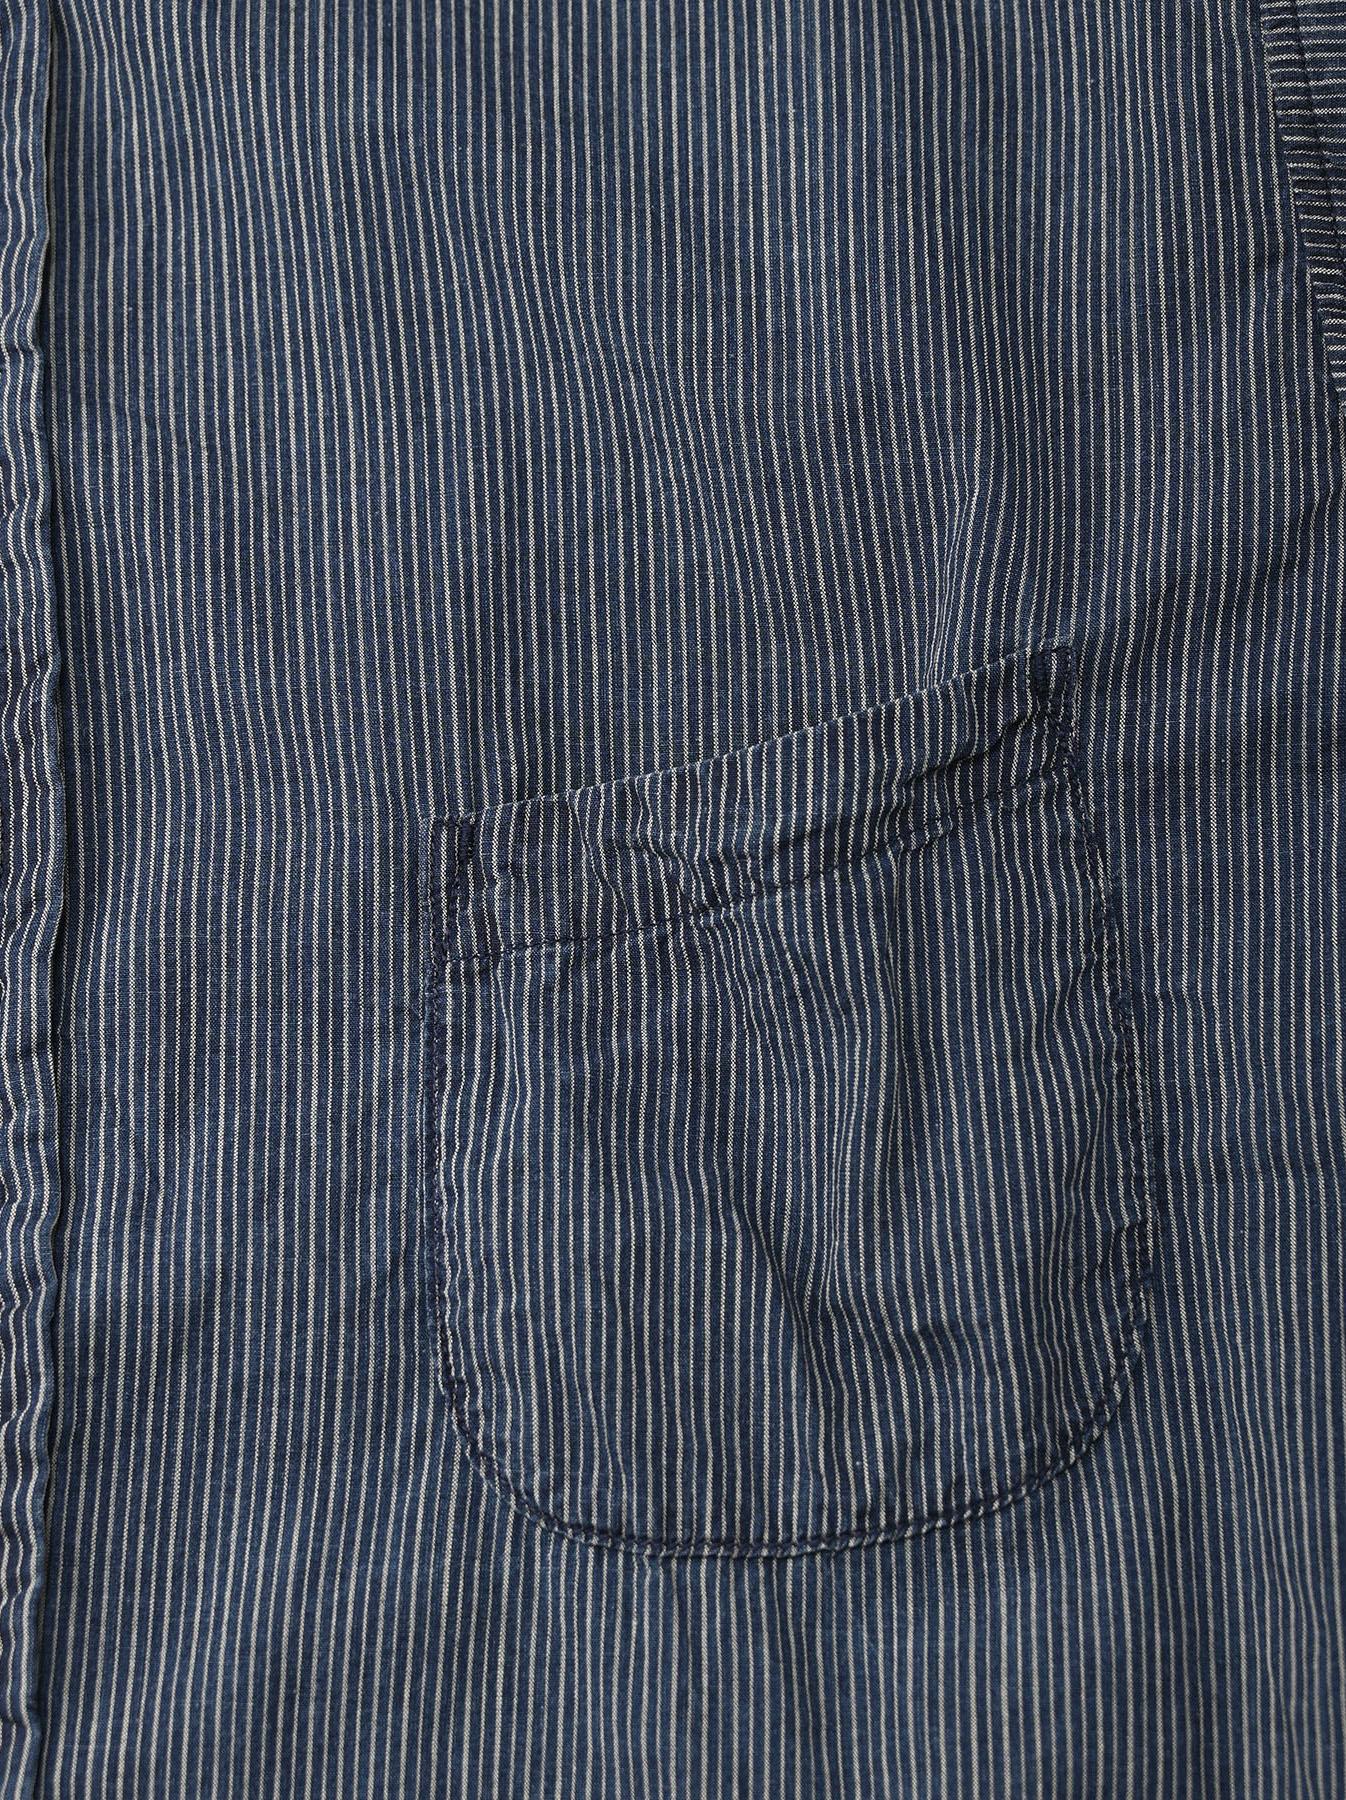 Indigo Hickory Tappet Ocean Stand Shirt-7